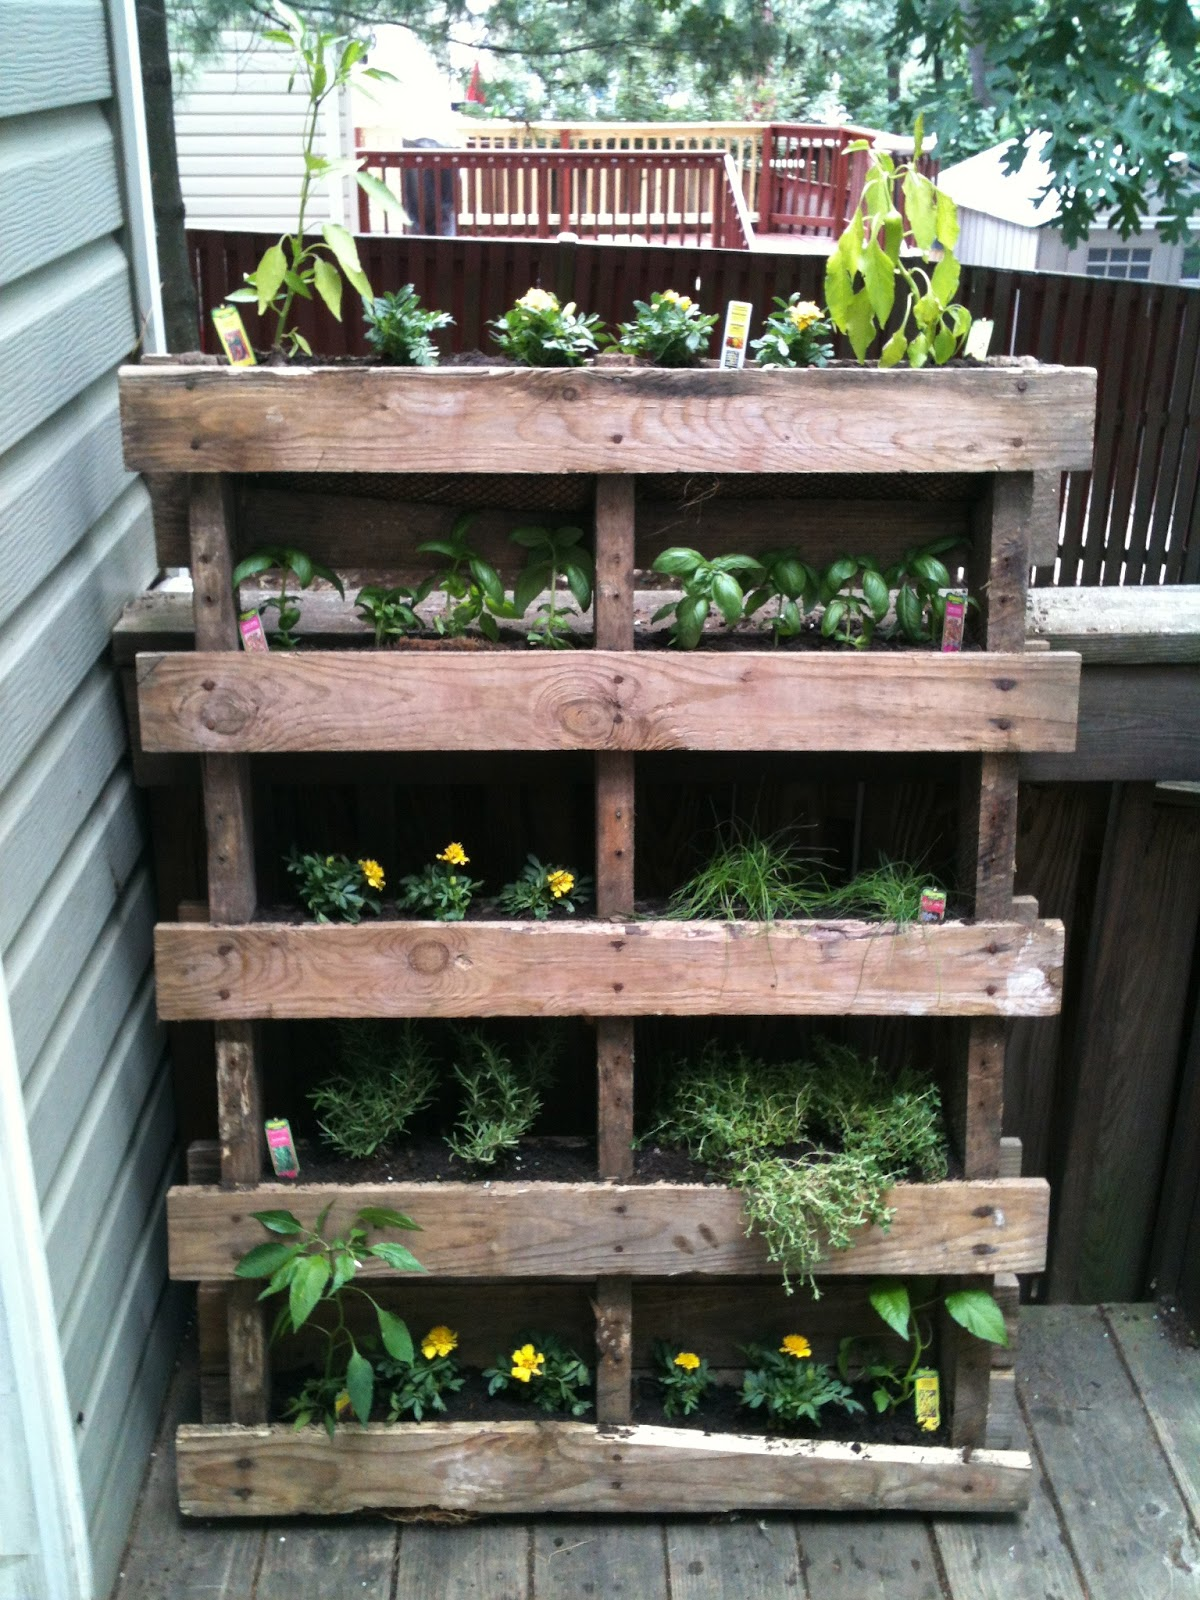 For Kids Amp Giggles Vertical Pallet Garden Project